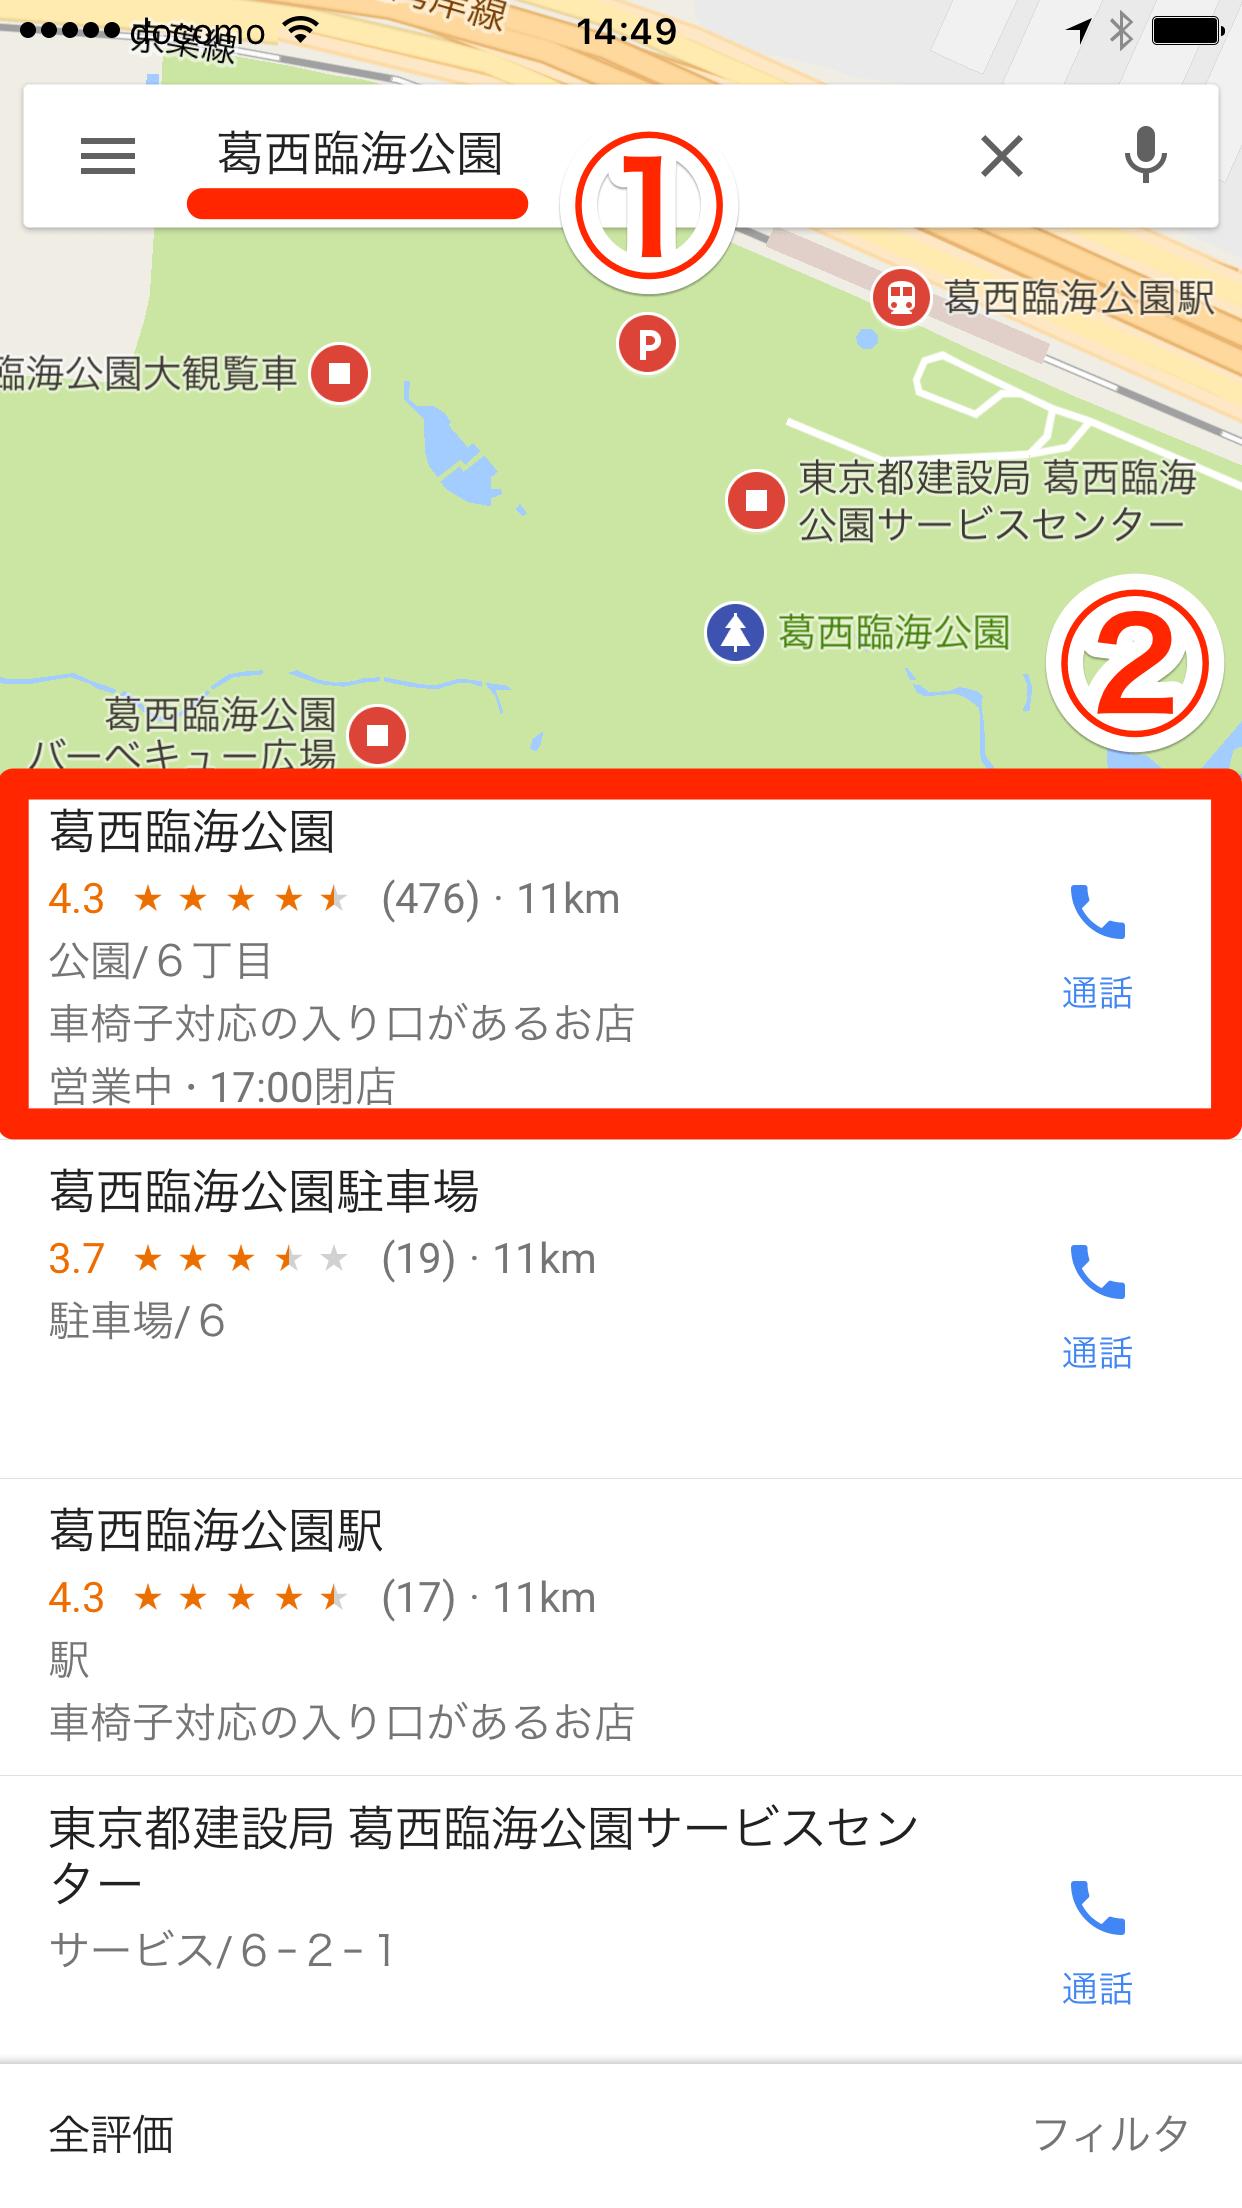 Googleマップ:リストに場所を保存・共有